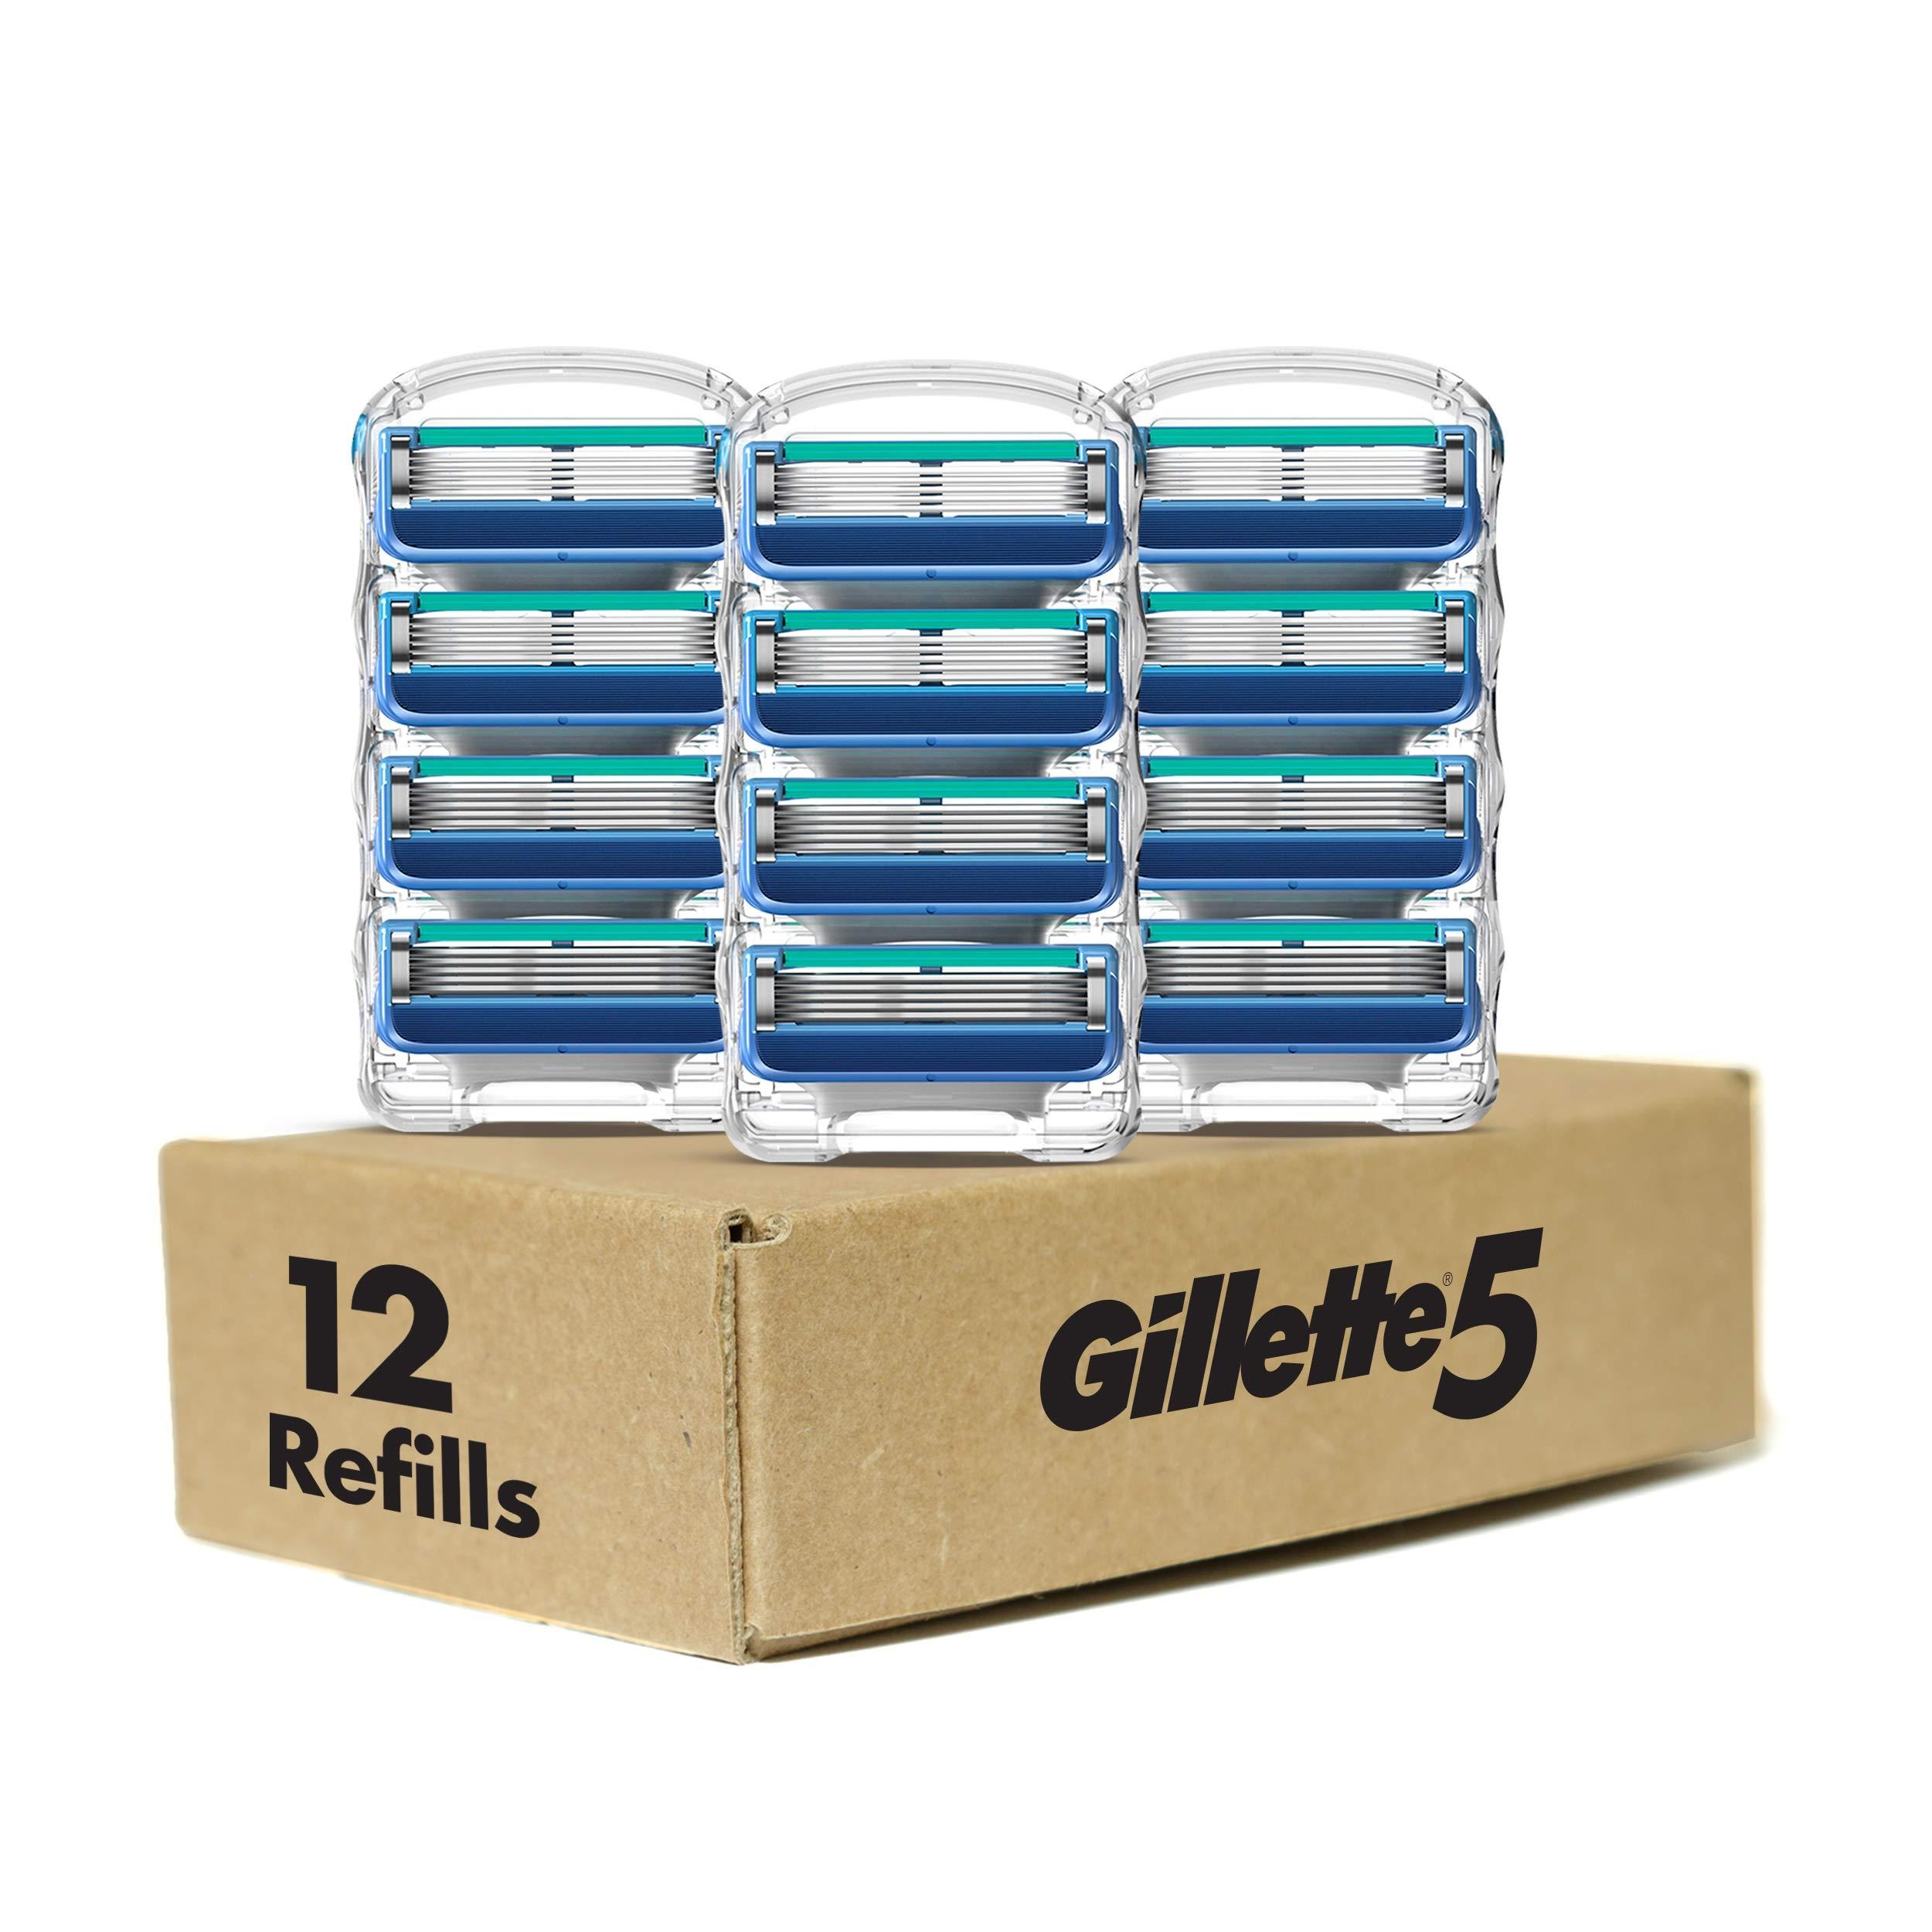 Amazon: 12 ct. Gillette5 Men's Razor Blade Refills $14.96 + Free Prime Shipping